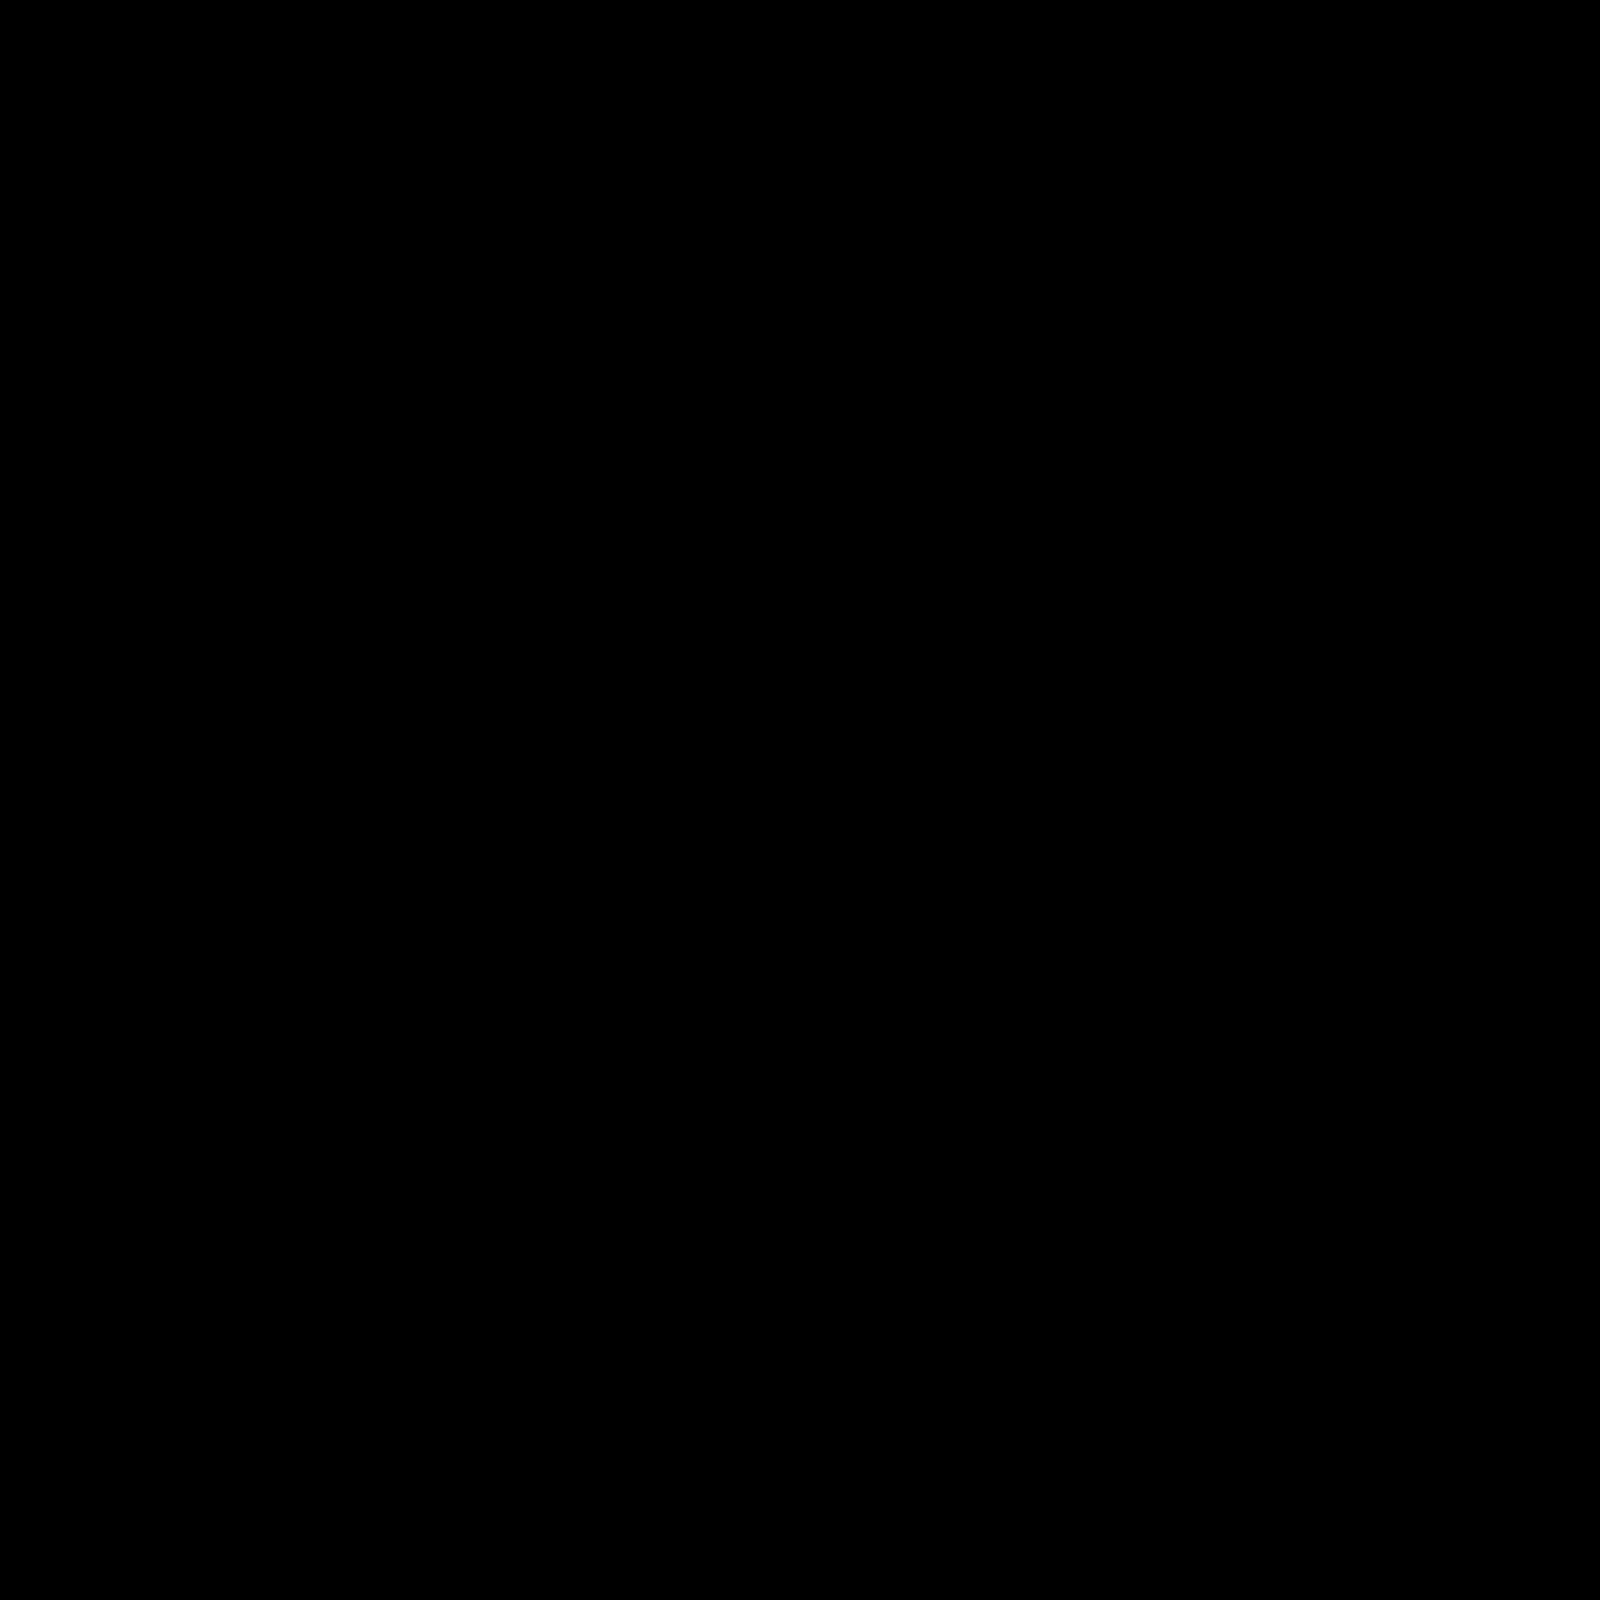 Oculus Rift Filled icon